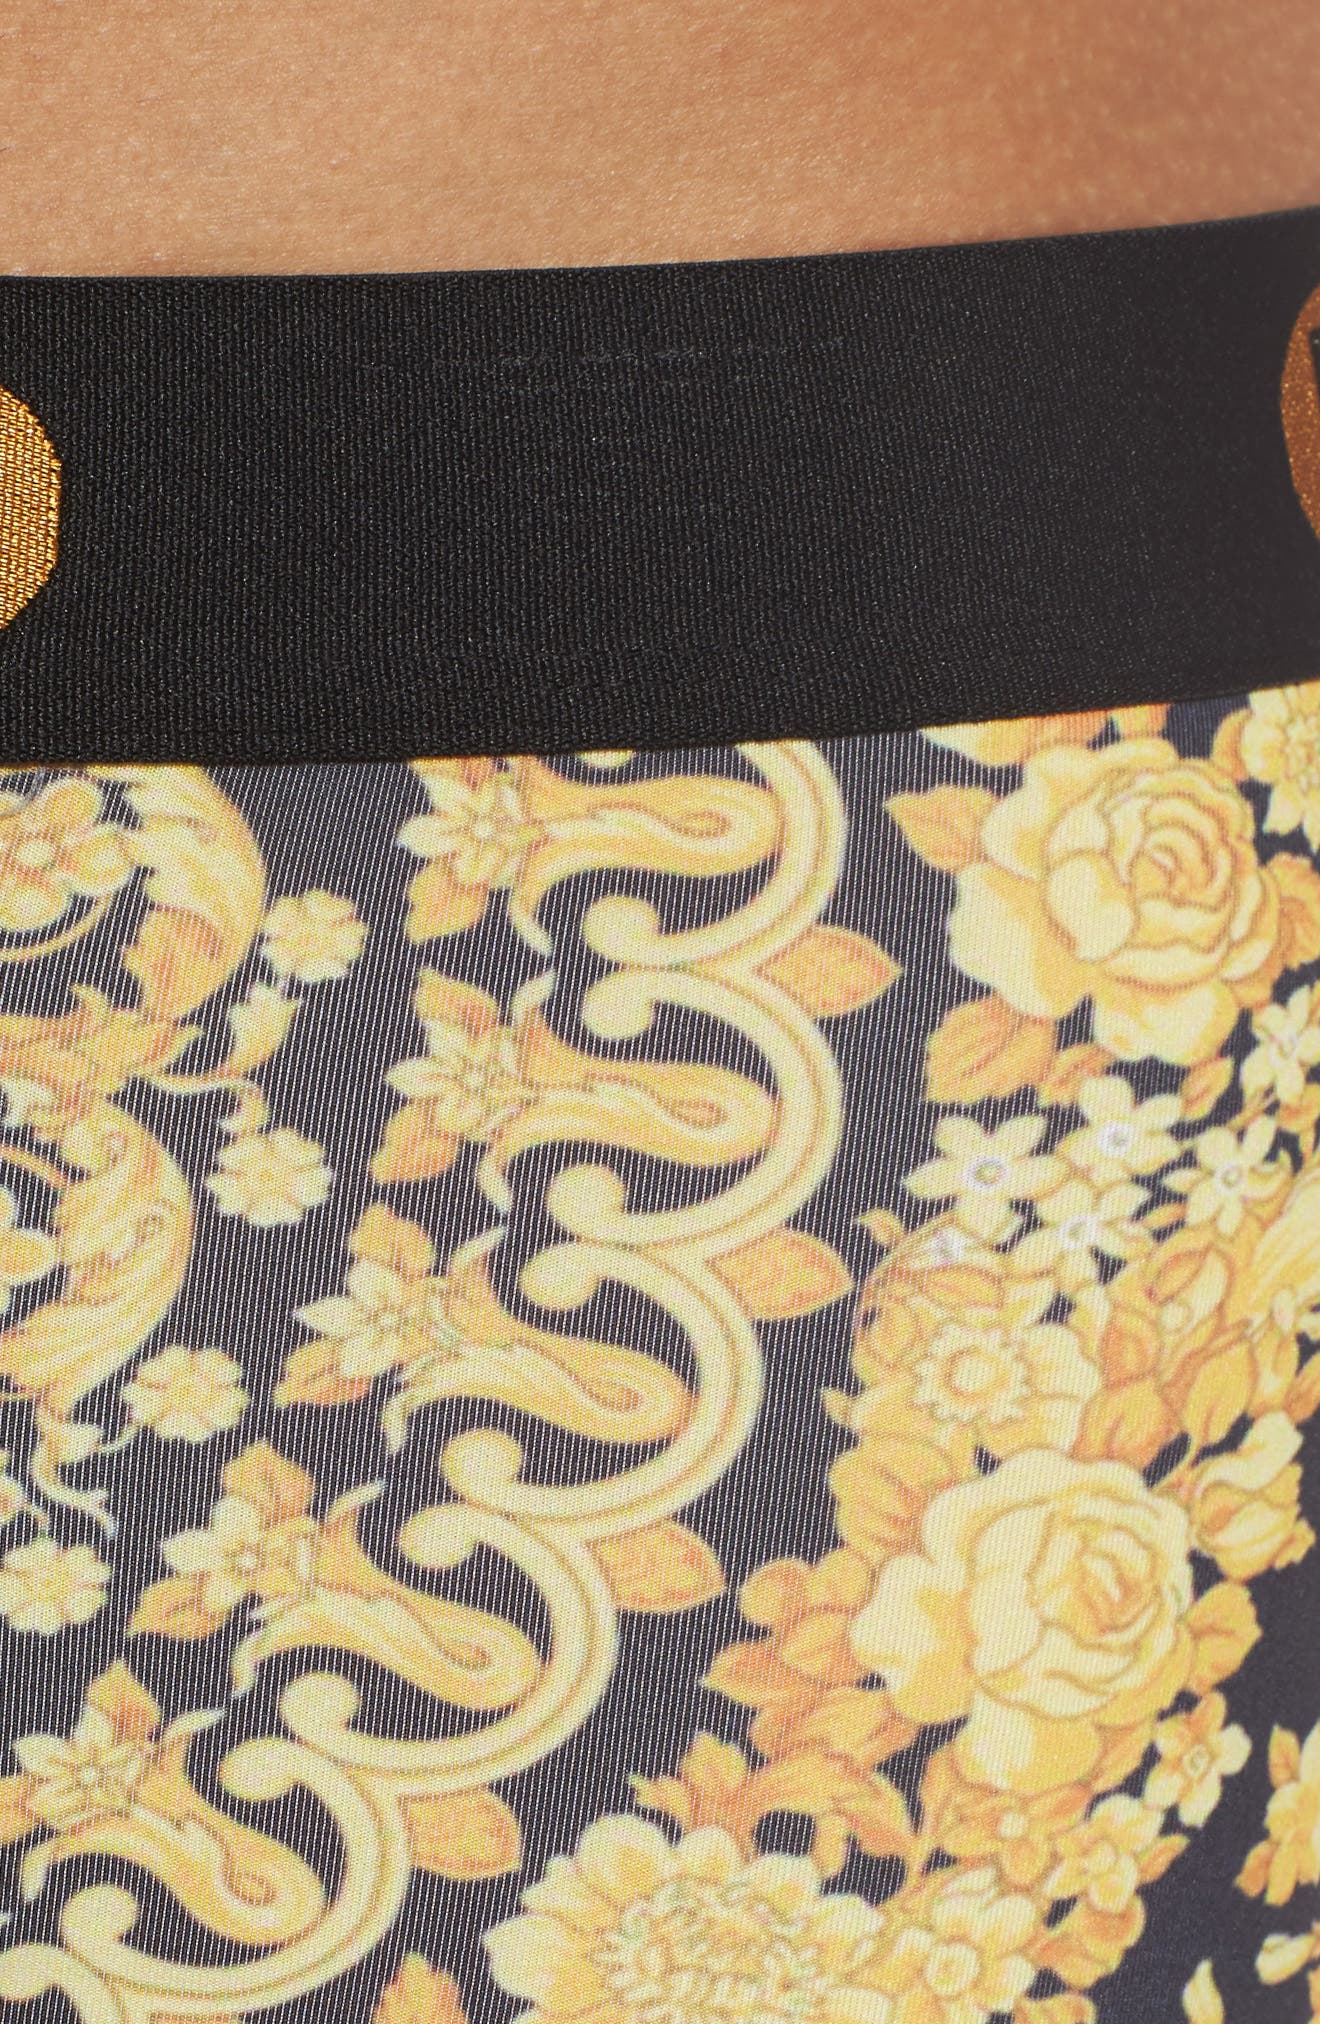 Gold Sace II Boxer Briefs,                             Alternate thumbnail 4, color,                             710